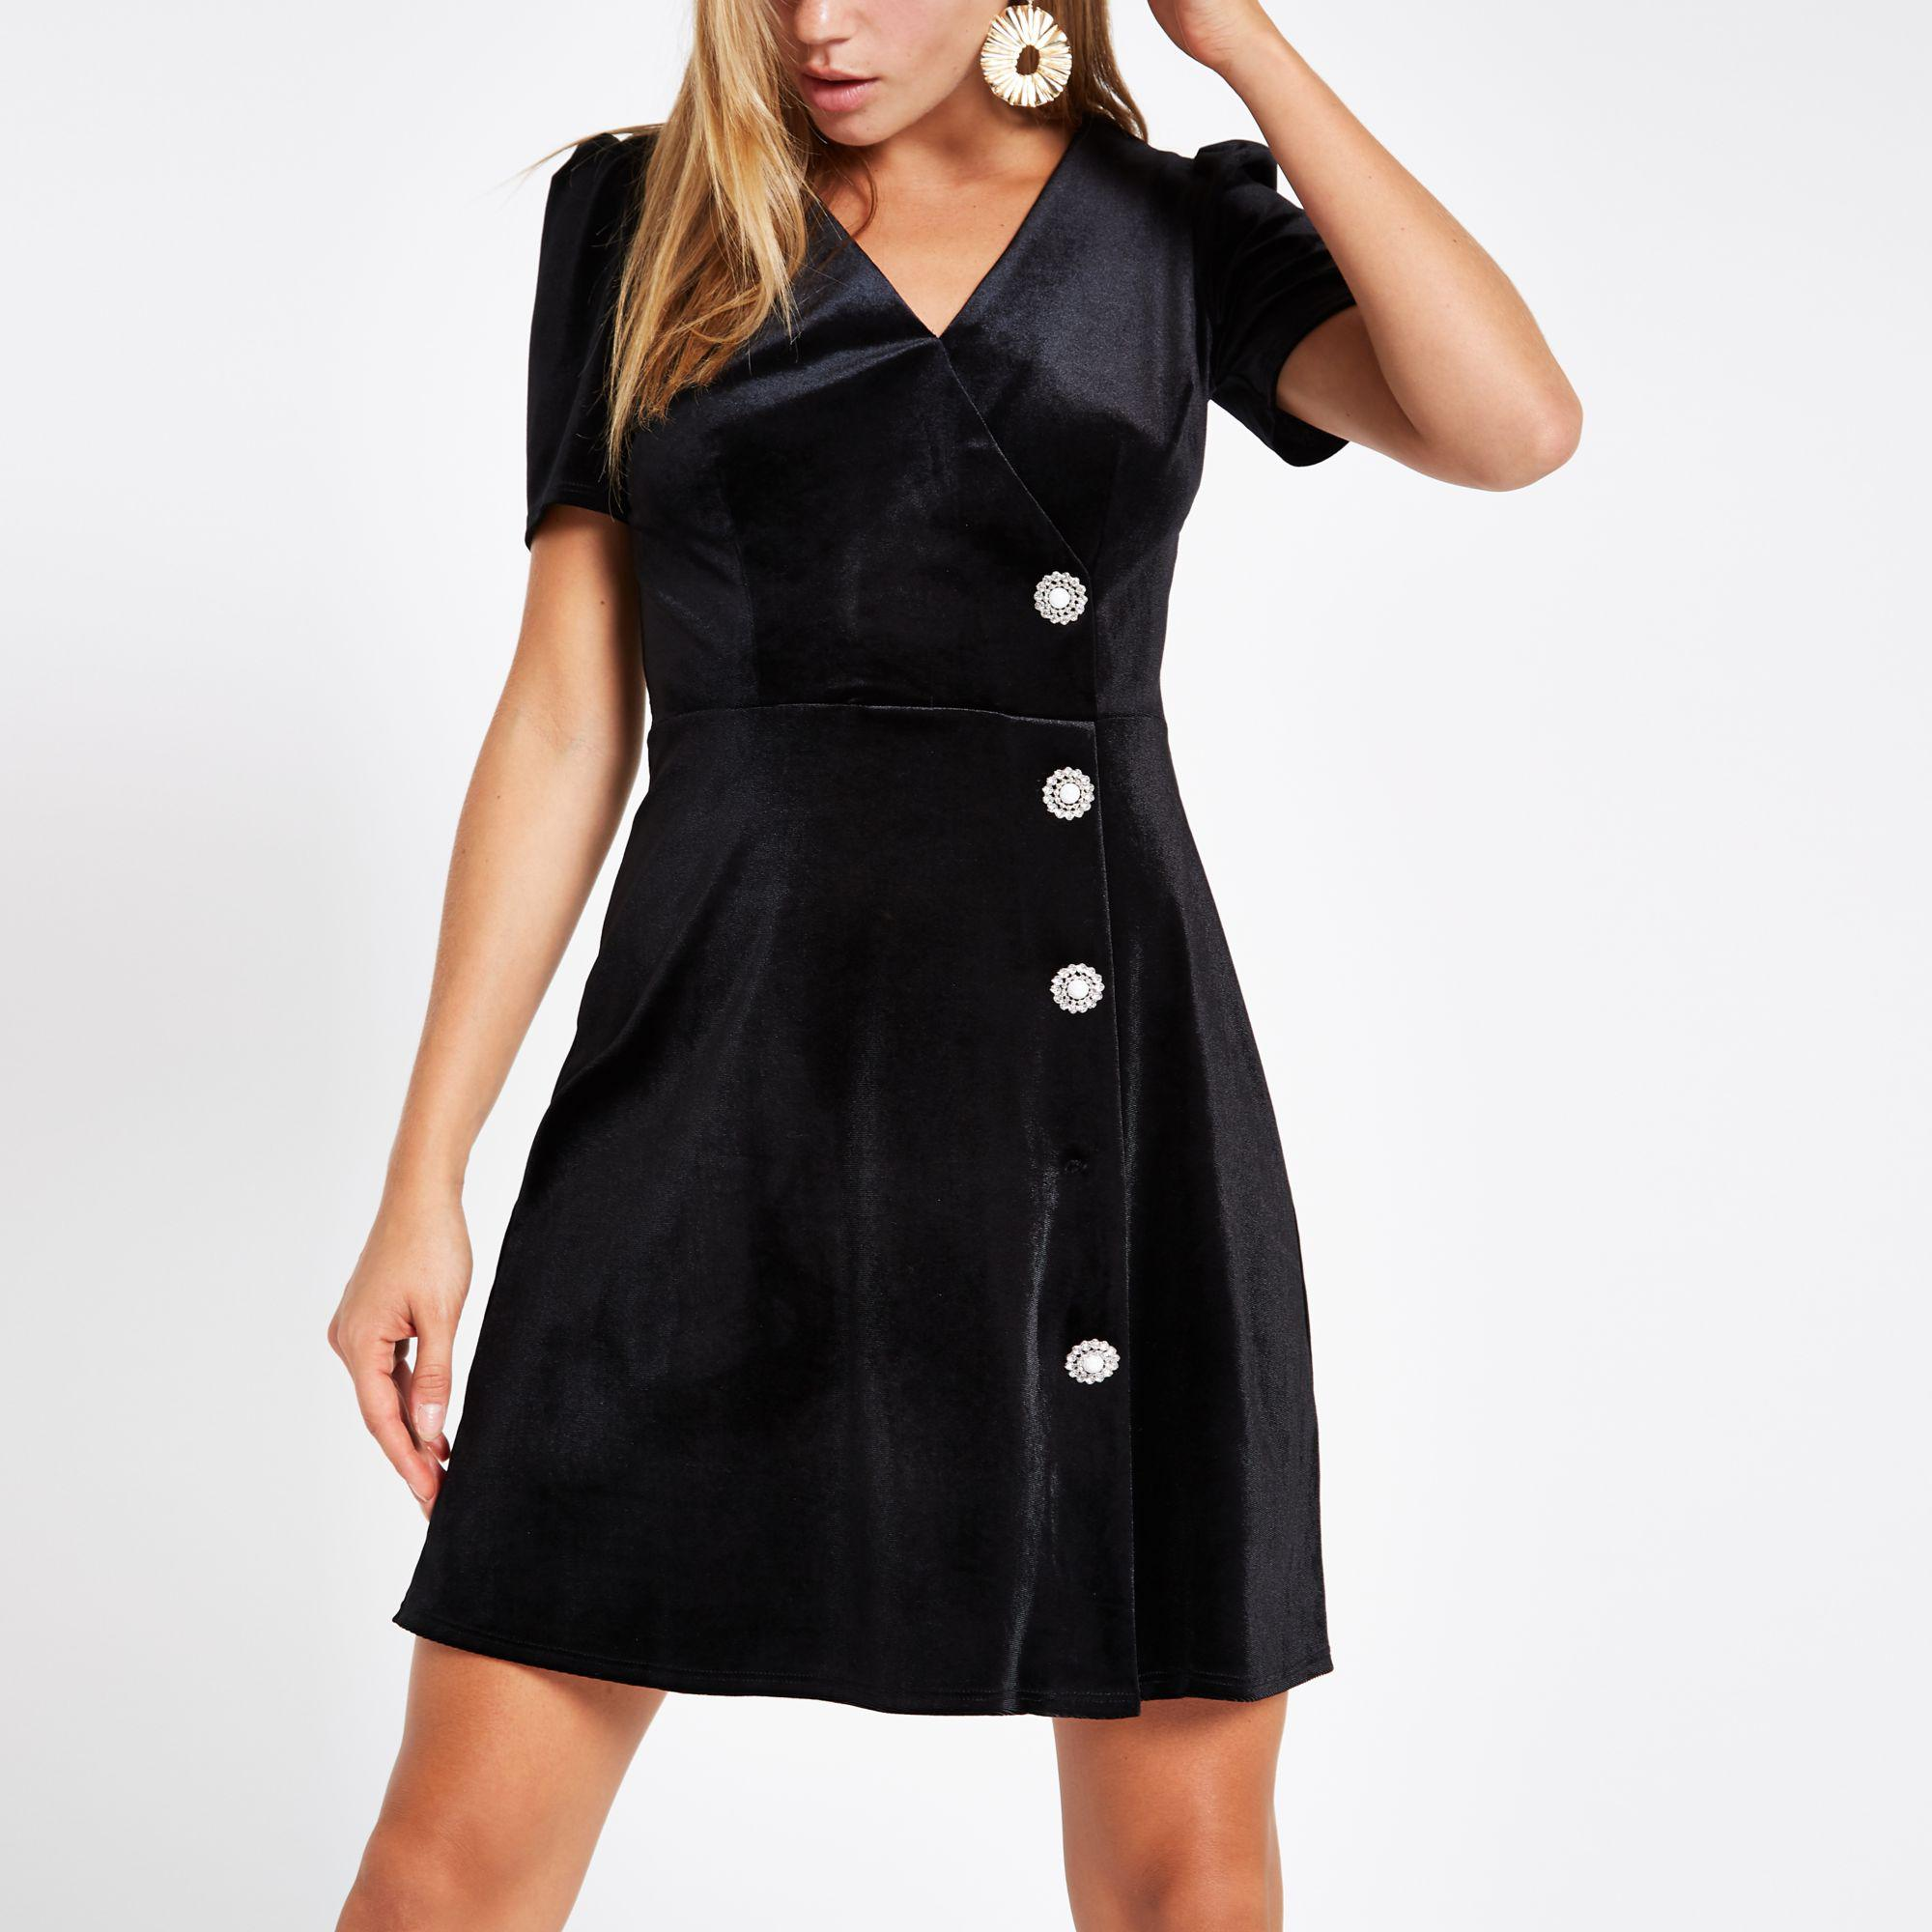 c030724533 River Island Black Velvet Embellished Button Mini Dress in Black - Lyst